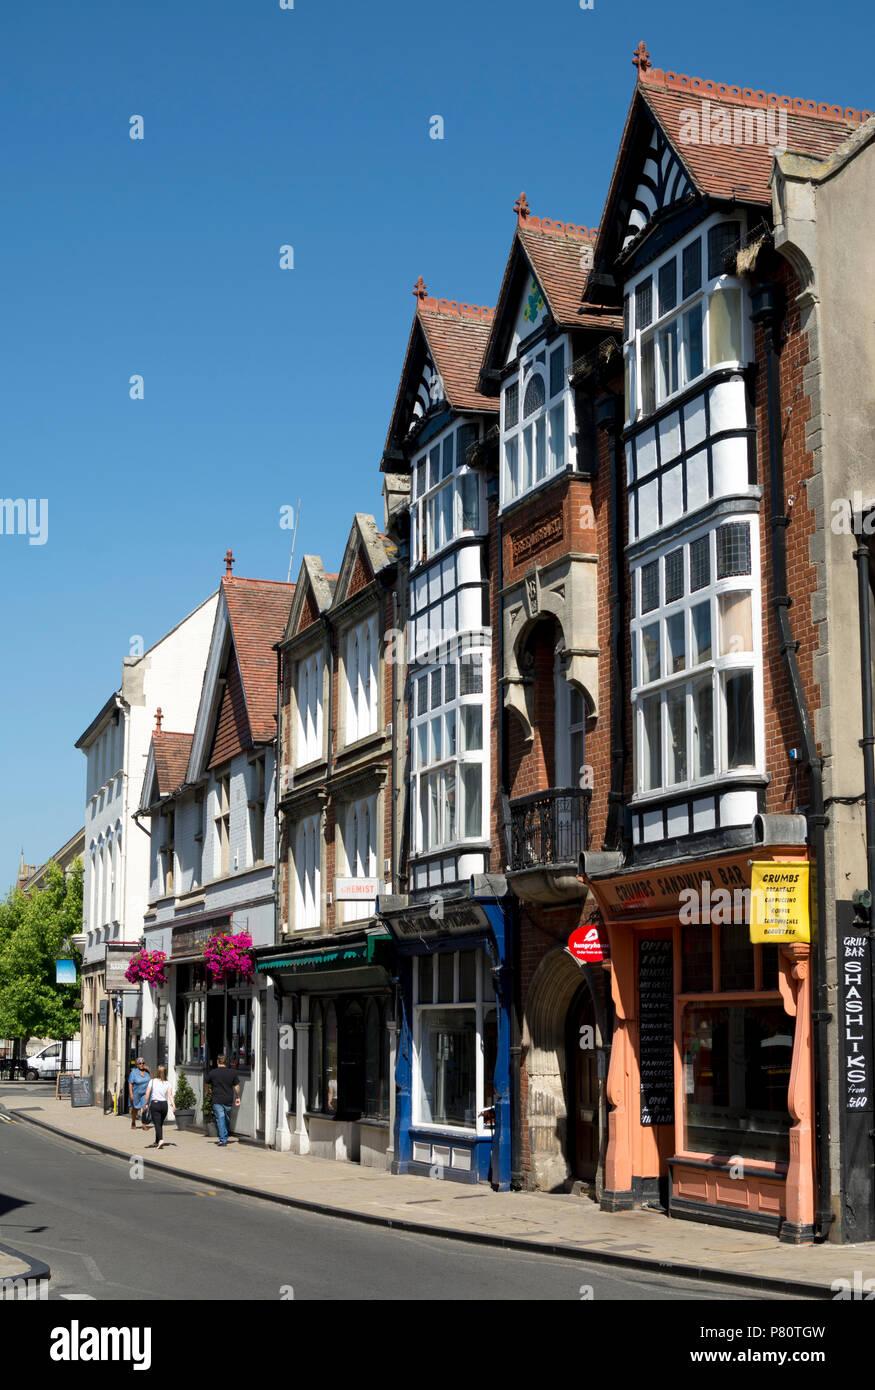 High Street, Abingdon, Oxfordshire, England, UK - Stock Image